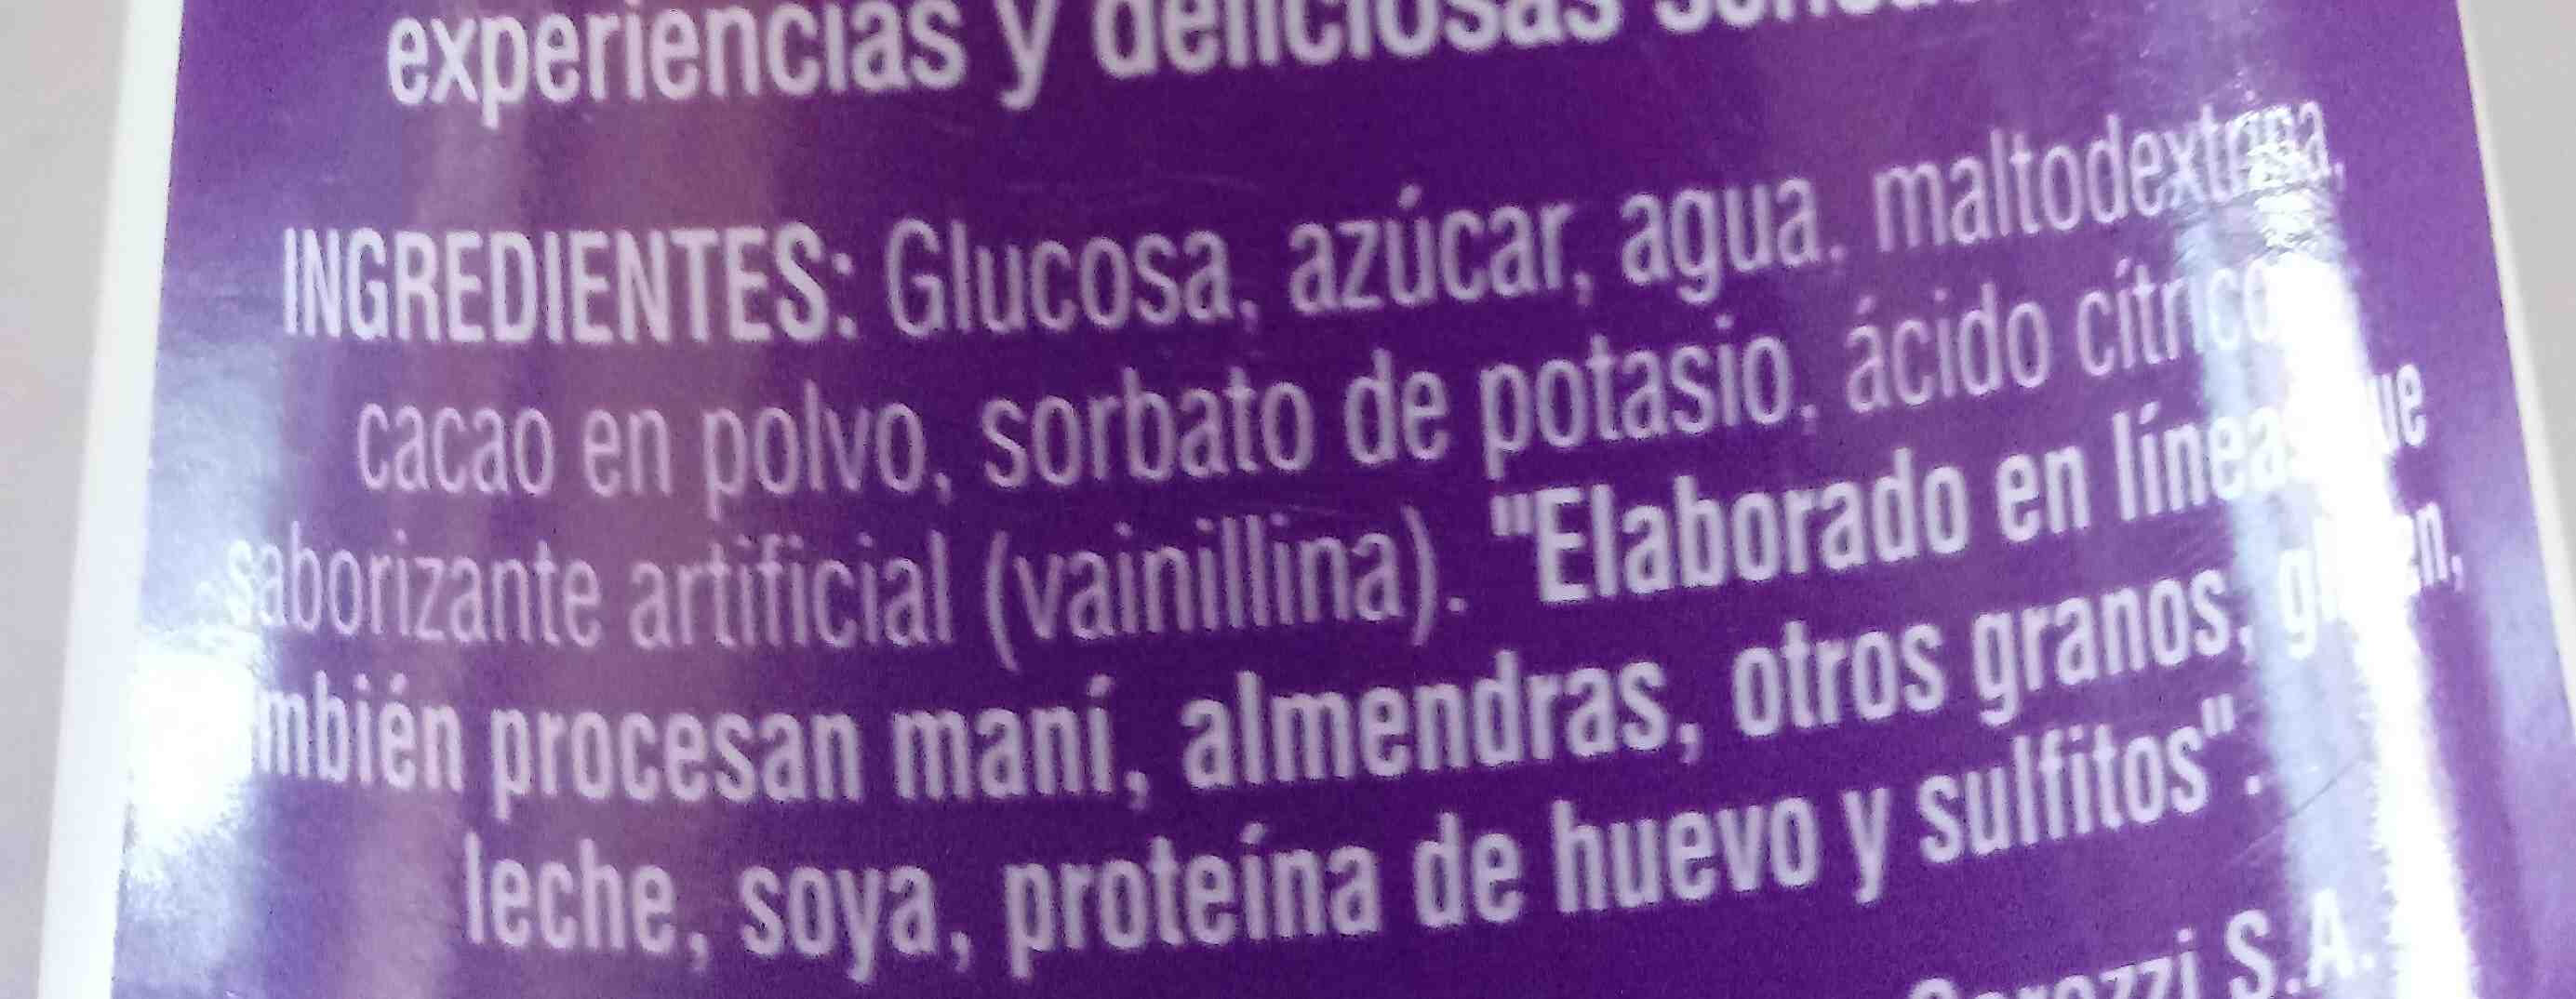 salsa sabor a chocolate - Ingredients